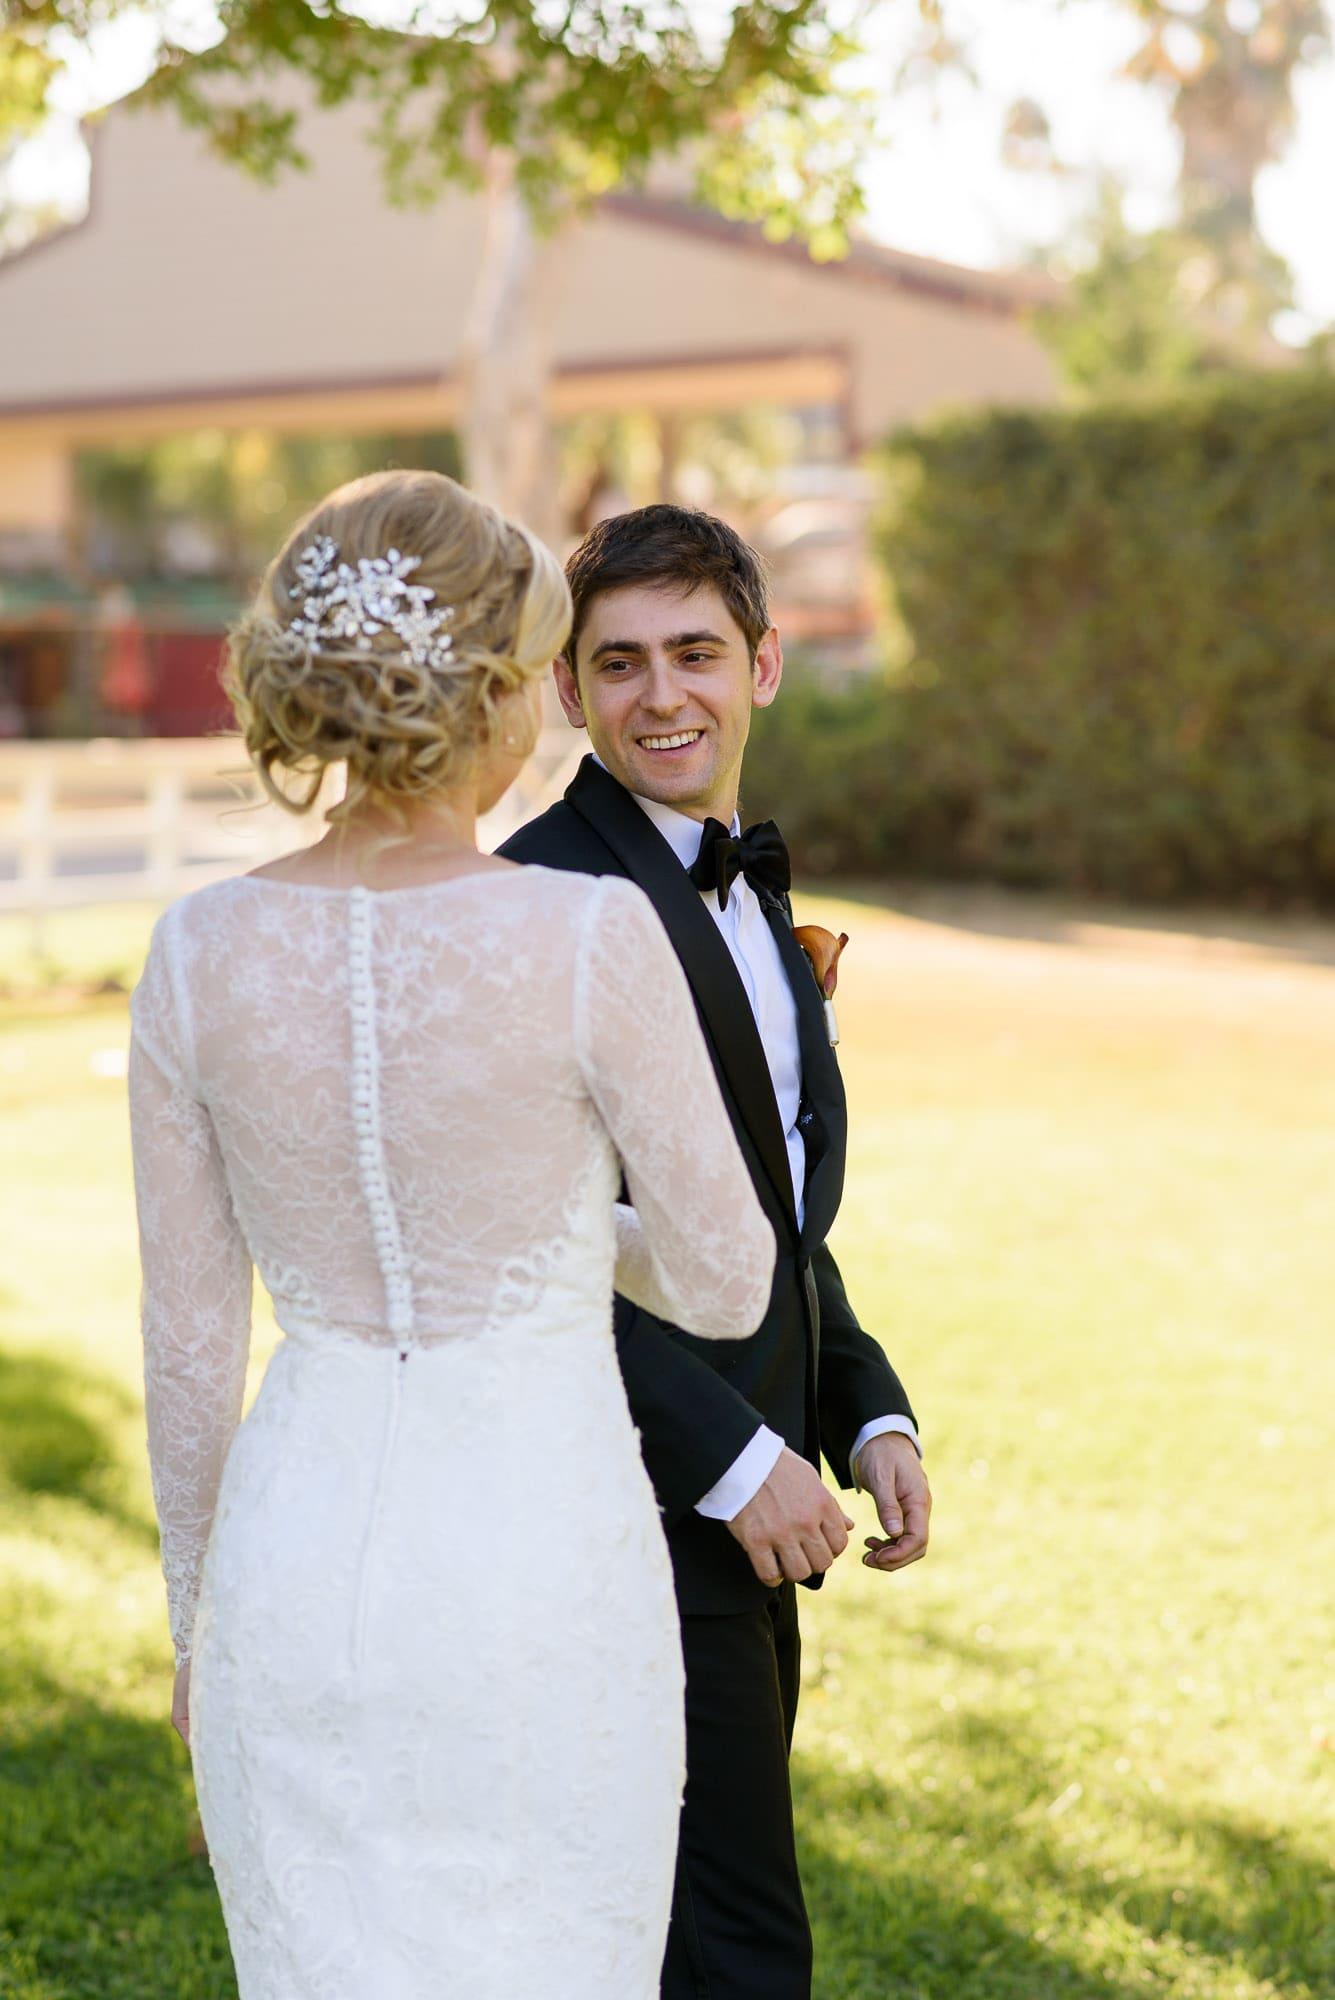 020_Alan_and_Heidi_Los_Angeles_Equestrian_Center_Wedding